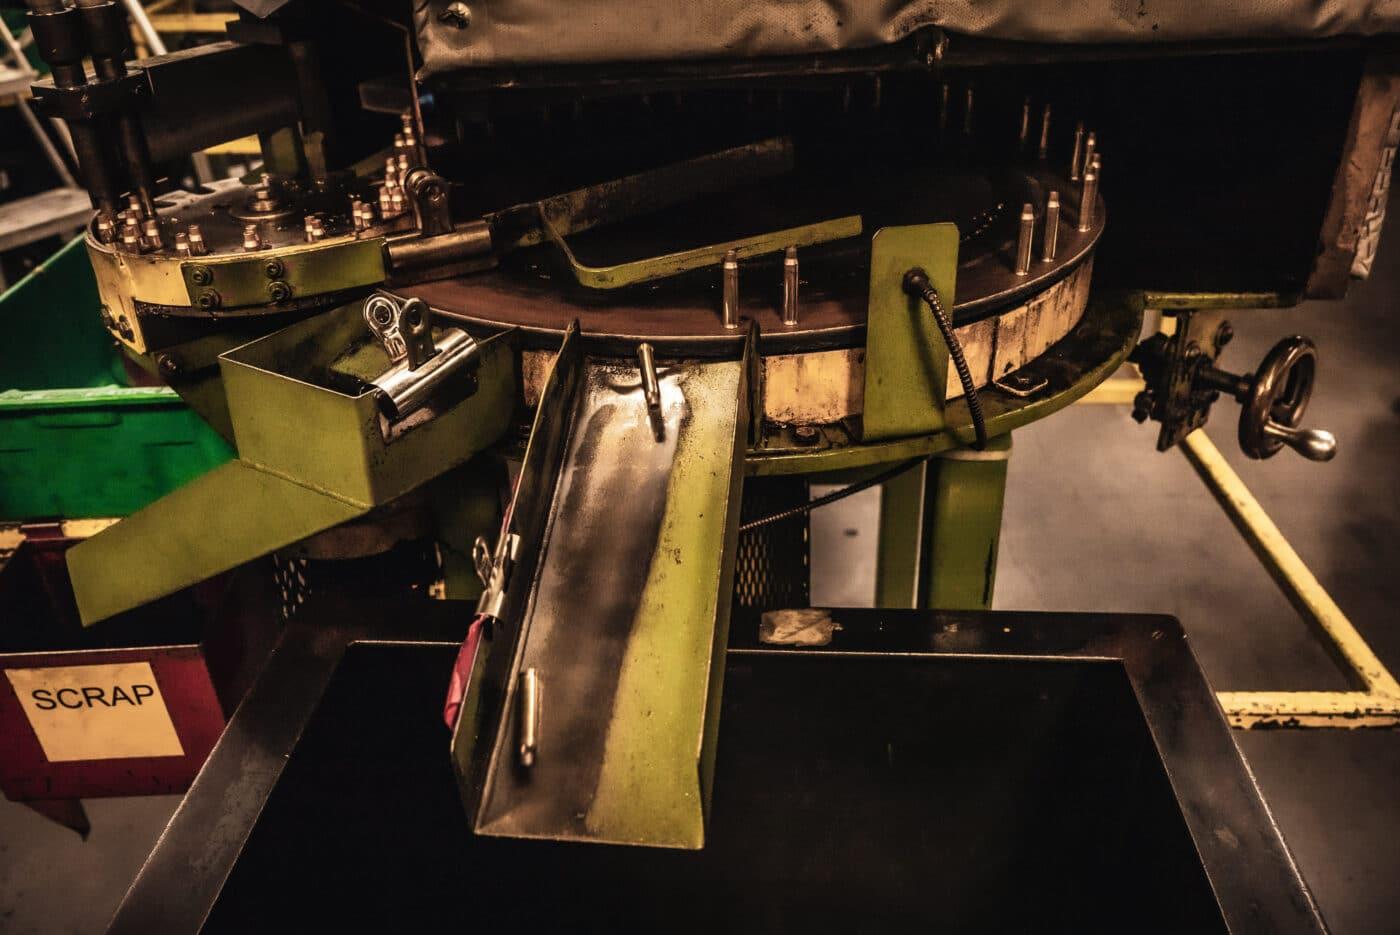 Interior shot of Remington Ammunition manufacturing plant